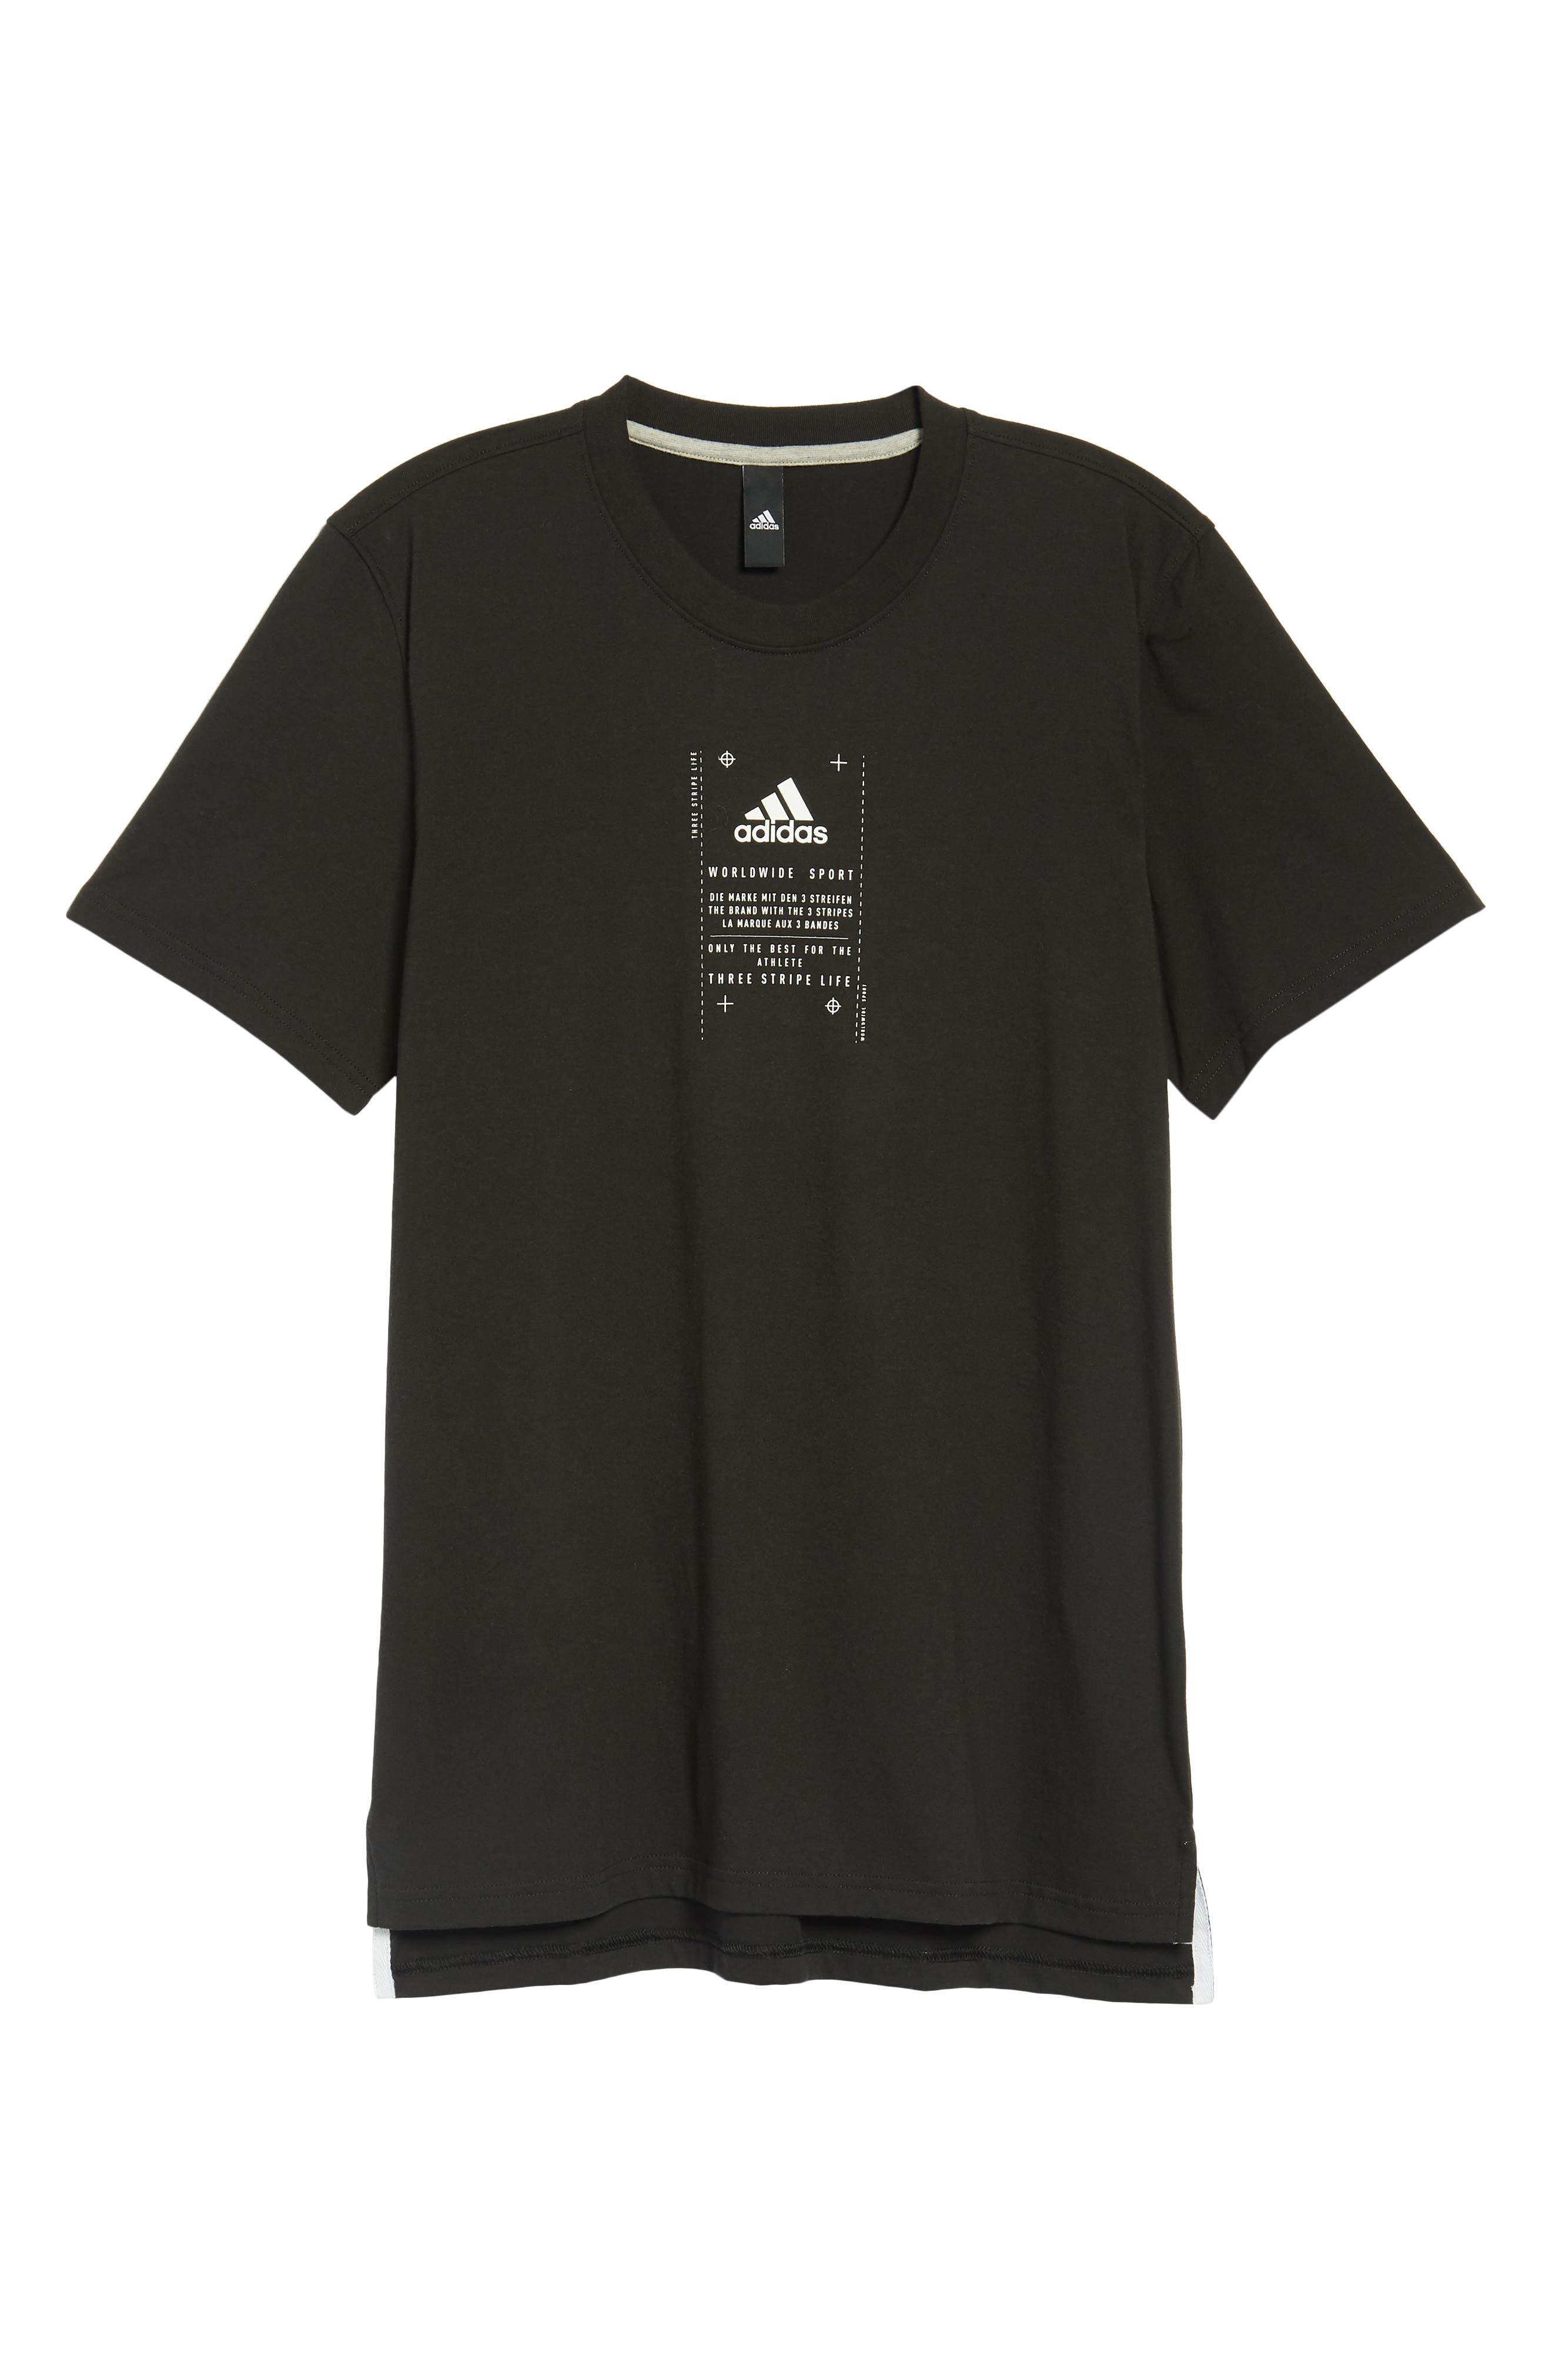 BOS Label T-Shirt,                             Alternate thumbnail 4, color,                             001